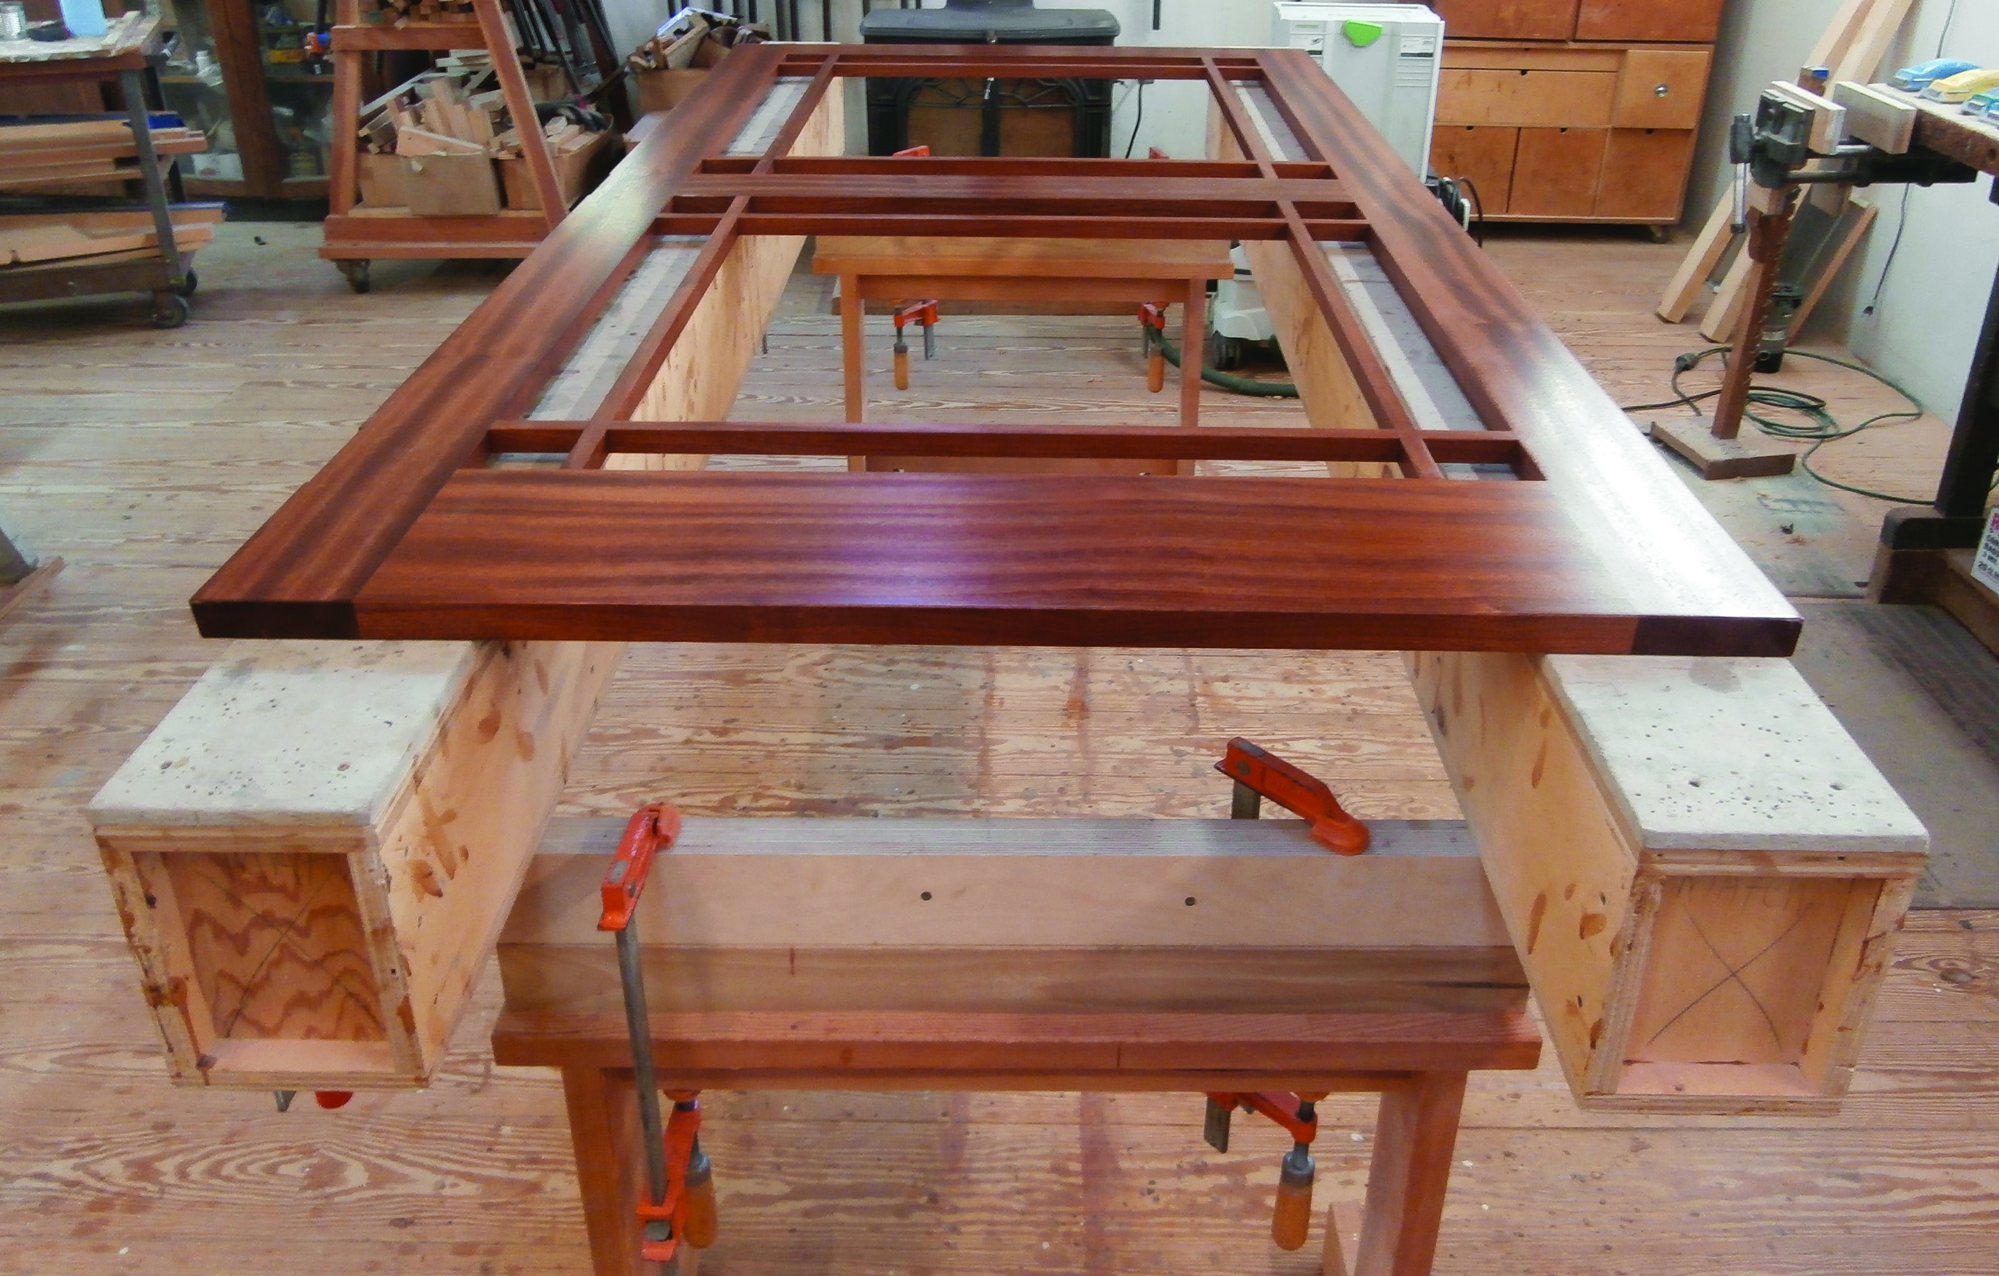 a finish carpenter's set of box beams   jlc online